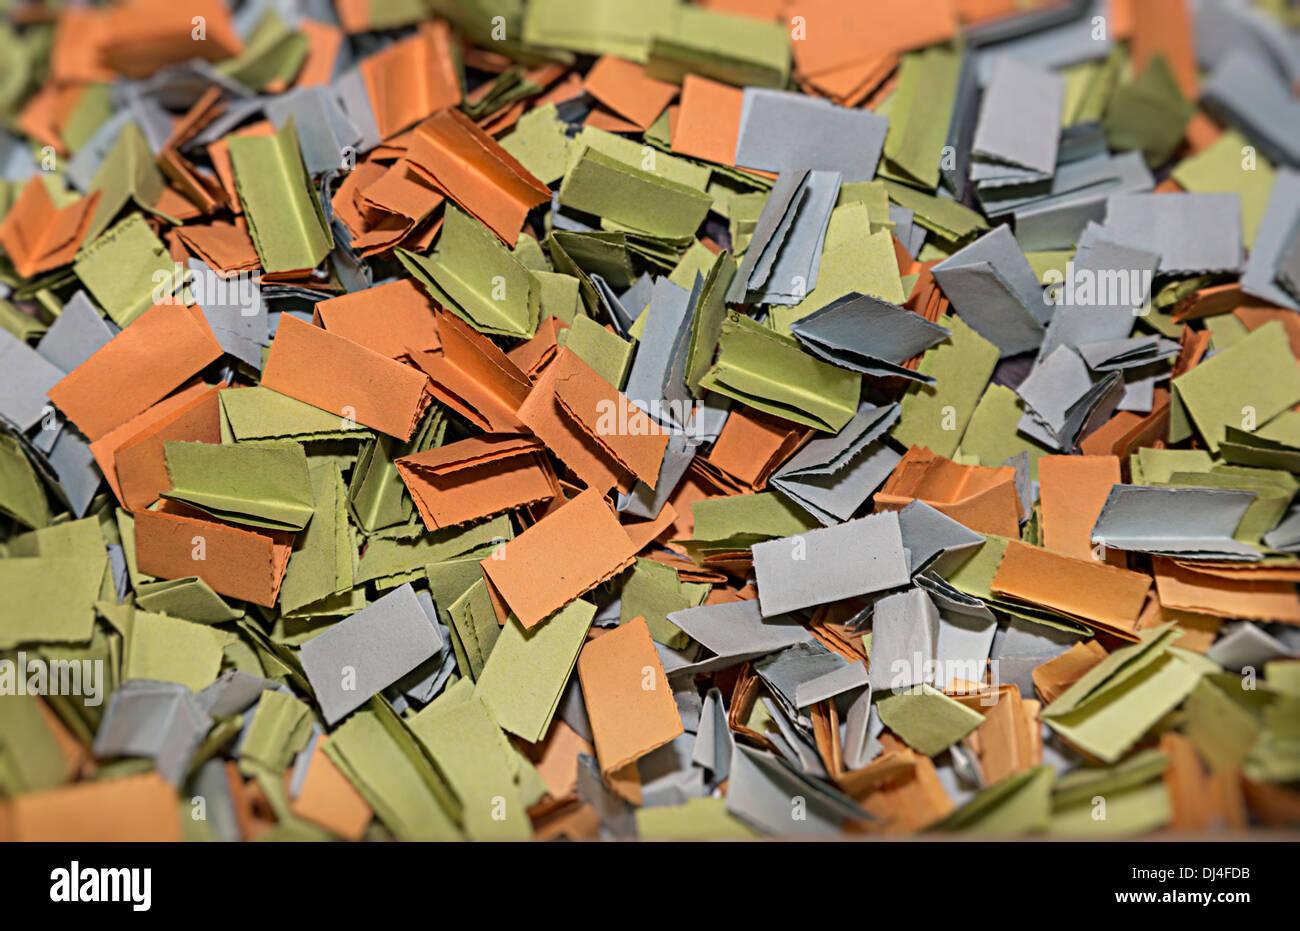 folded raffle tickets ready to be drawn